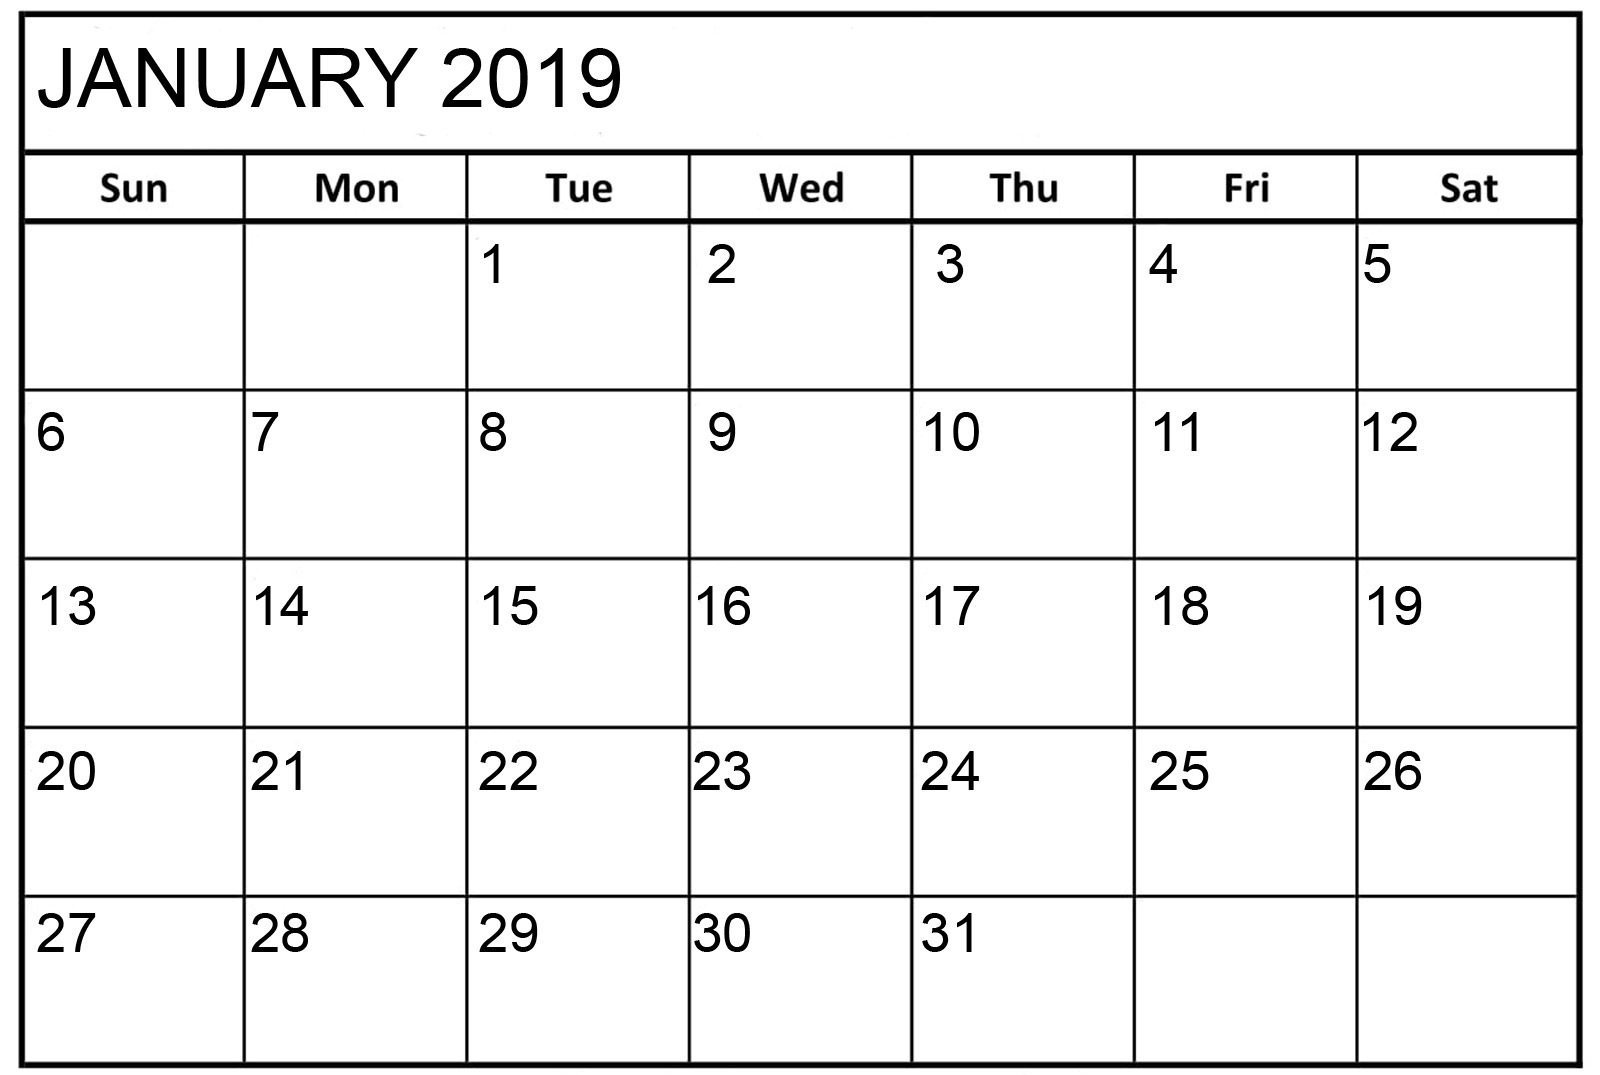 January 2019 Calendar Print Out